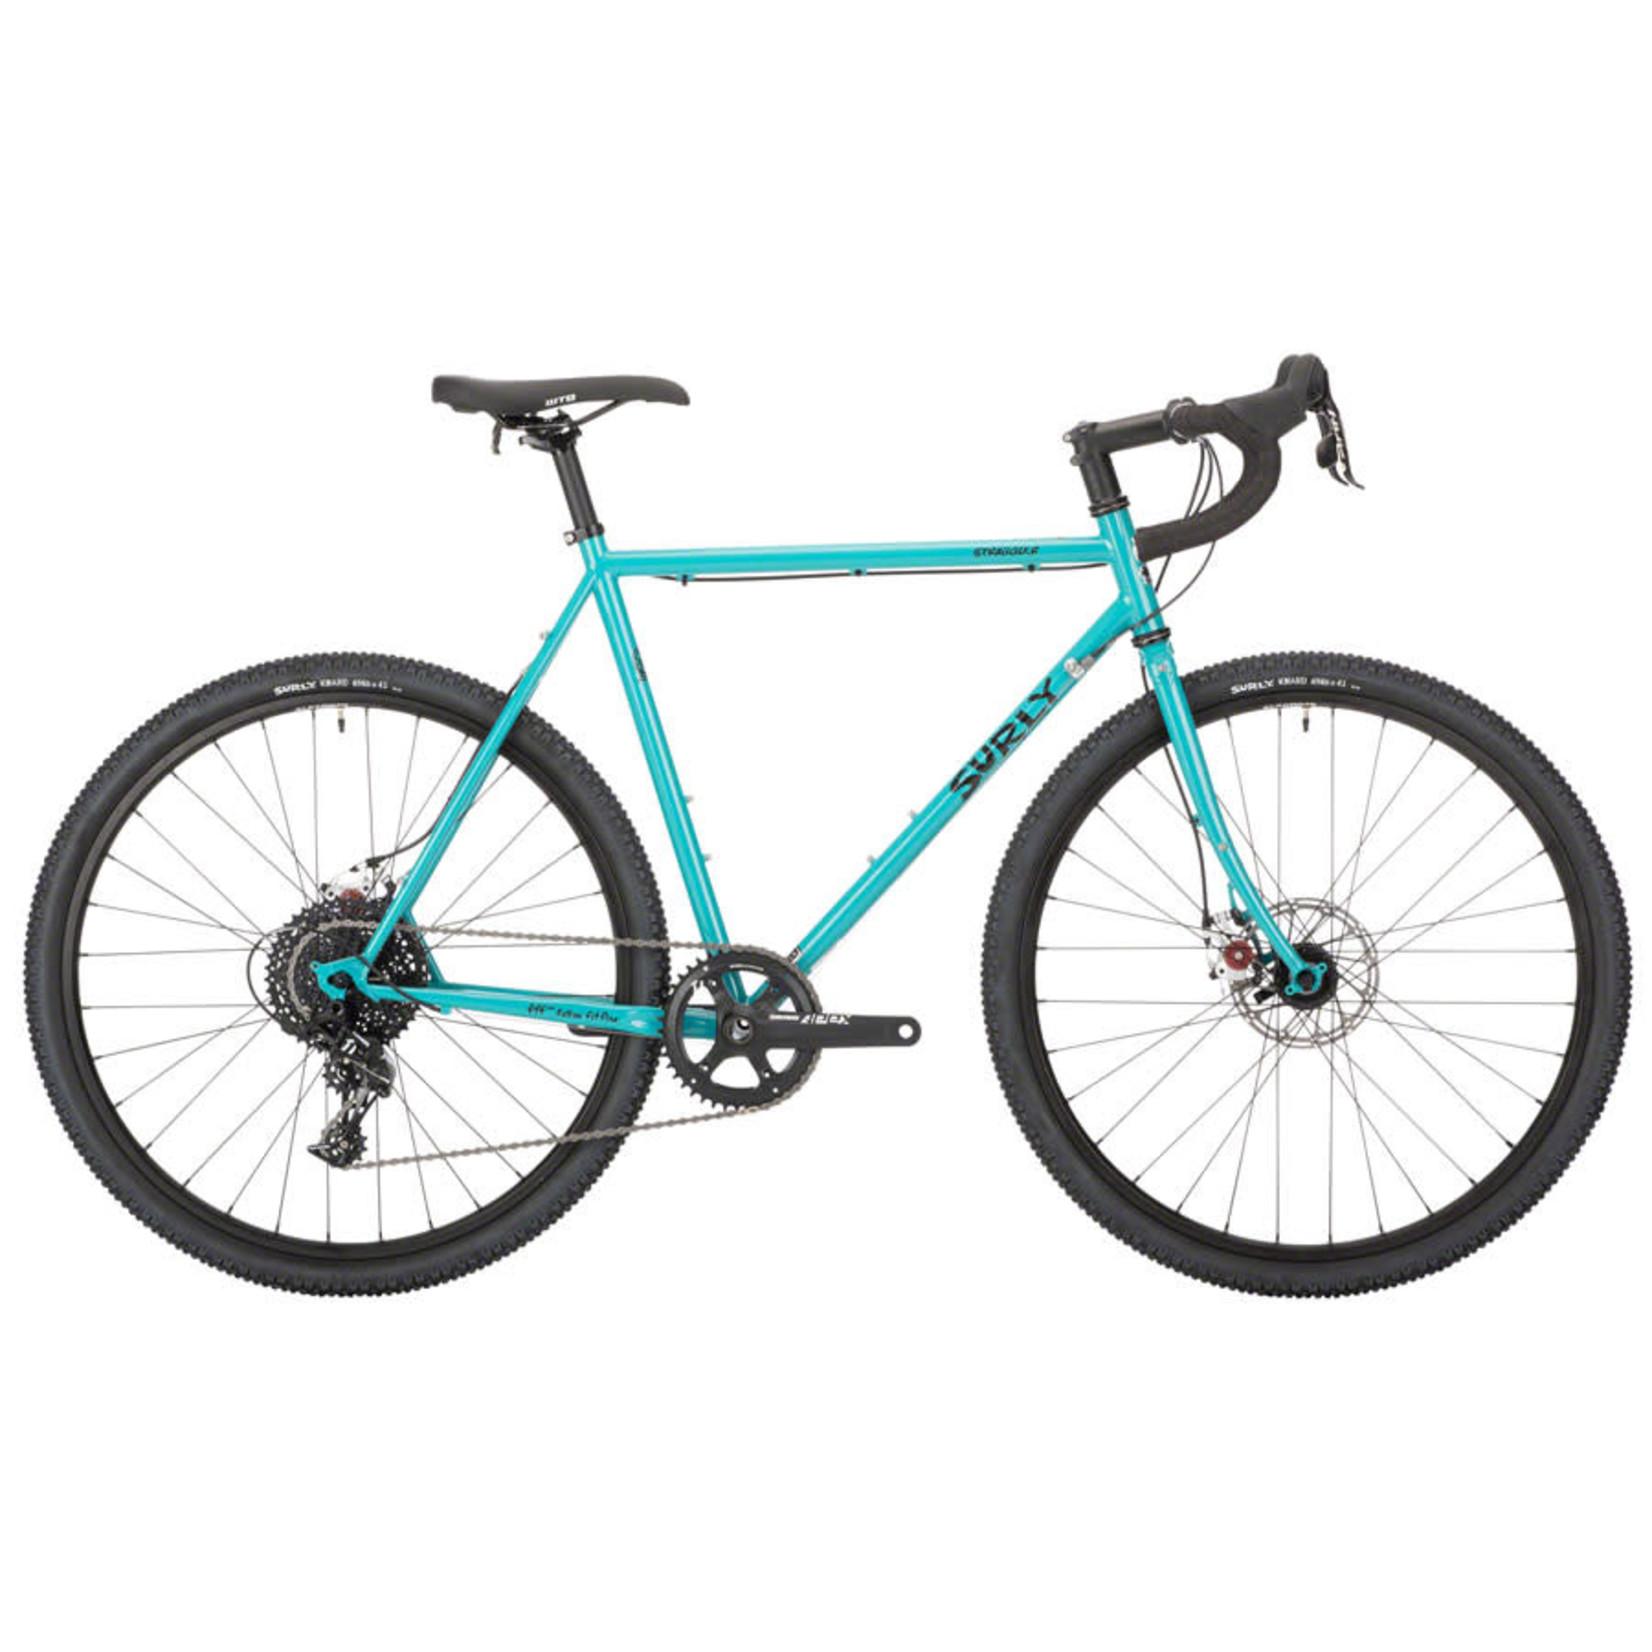 Surly Surly Straggler Bike - 650b, Steel, Chlorine Dream, 46cm